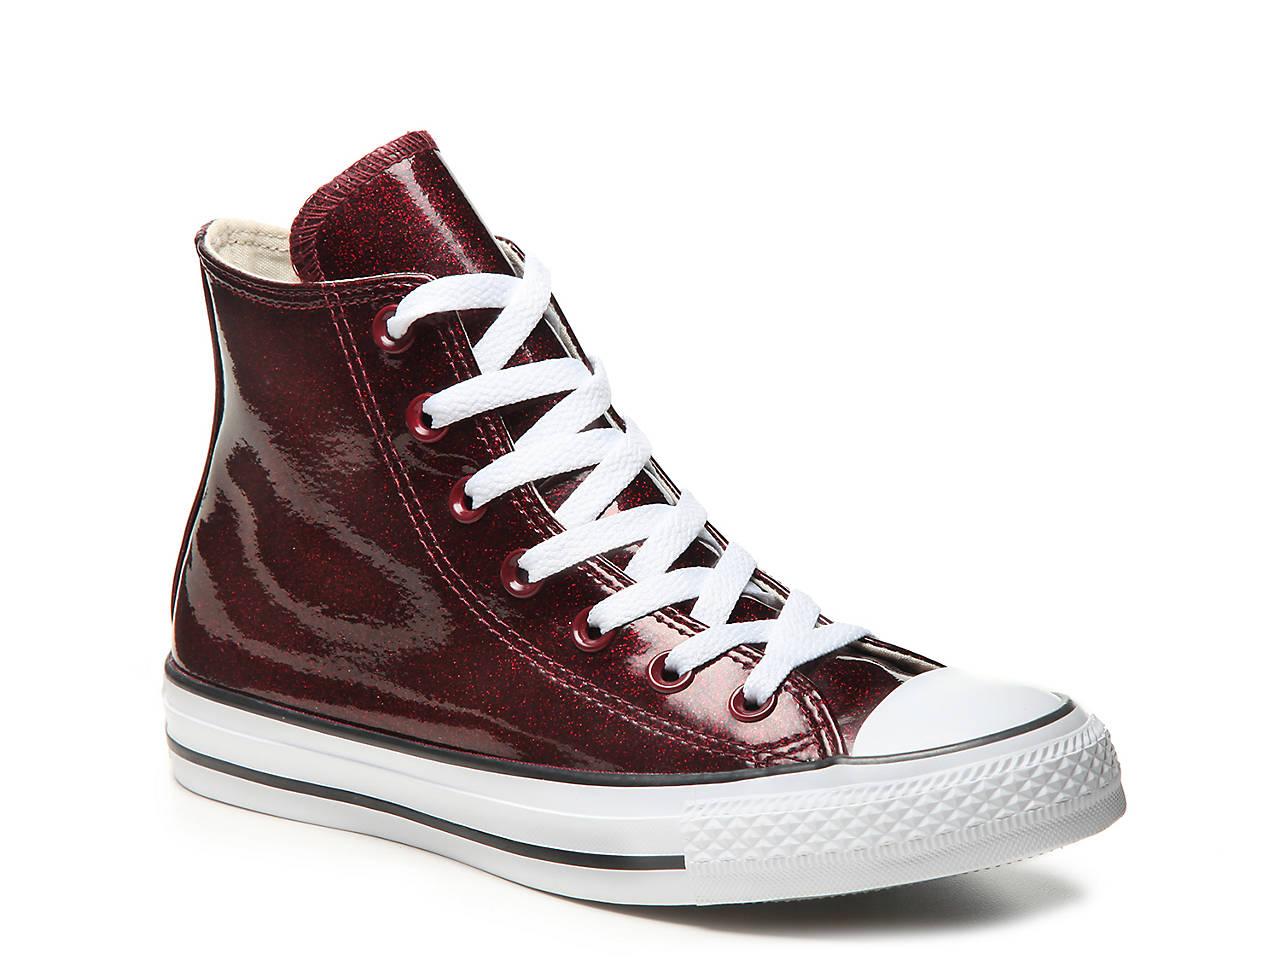 785b33708be6 Converse. Chuck Taylor All Star Bright Glitter High-Top Sneaker ...